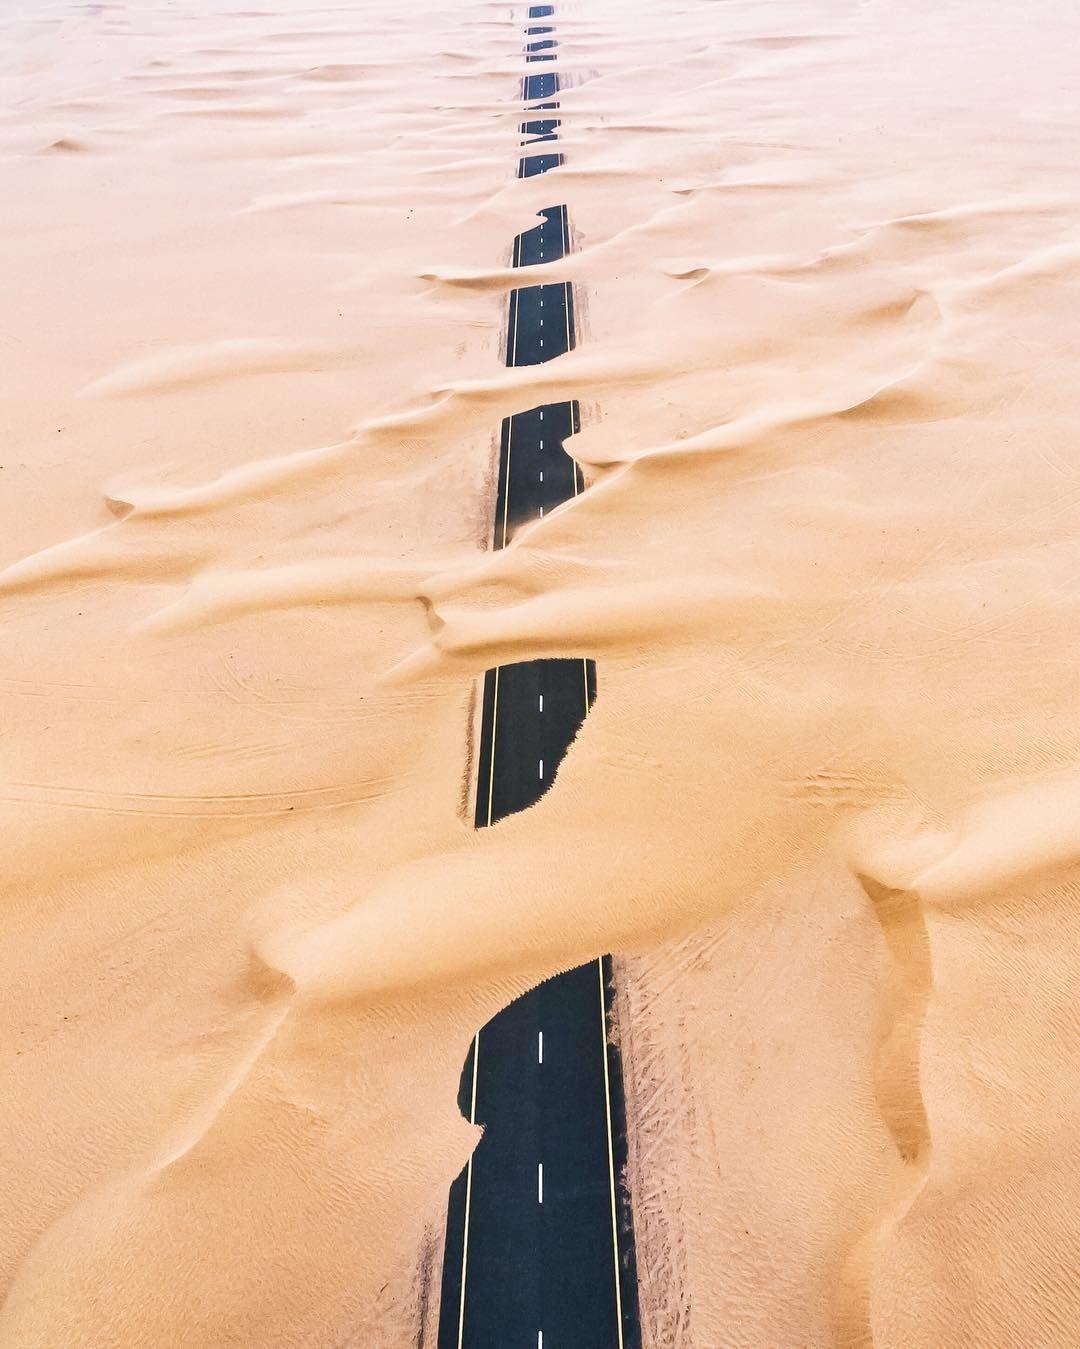 Wandering sands in Dubai by iHerok